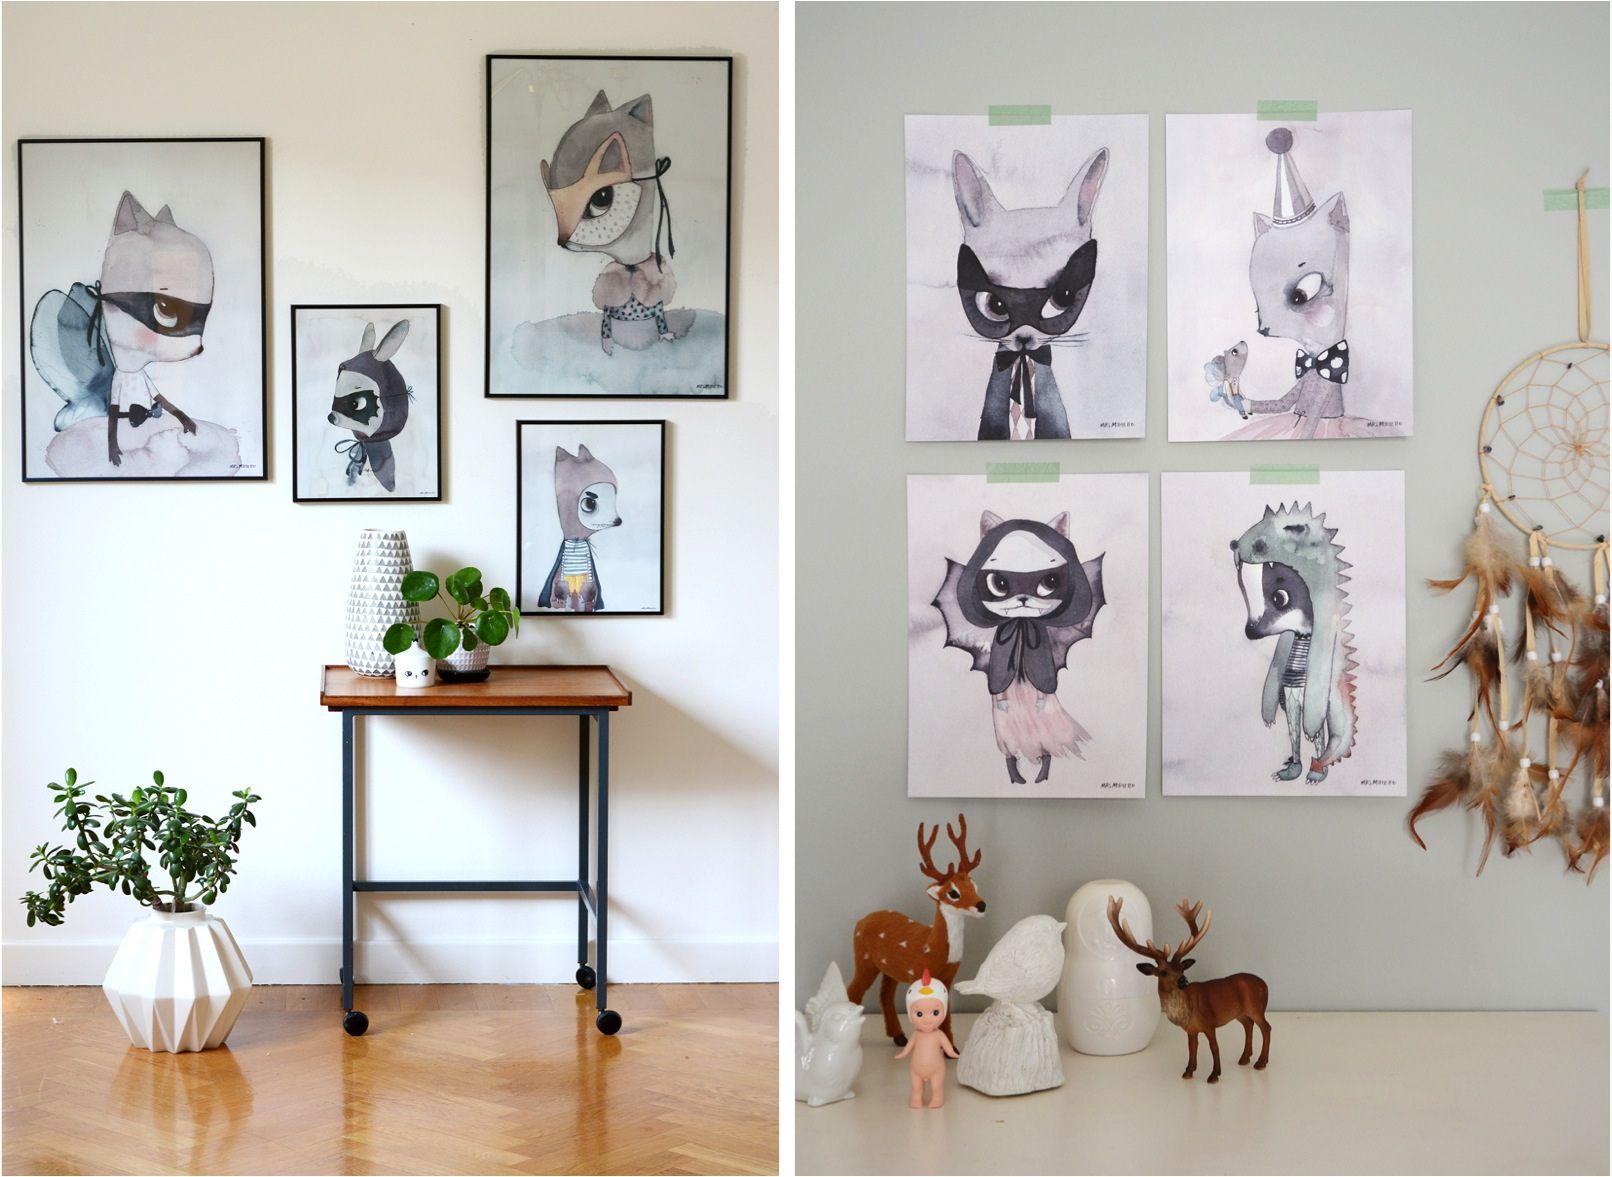 55 Kids Room Artwork Ideas to